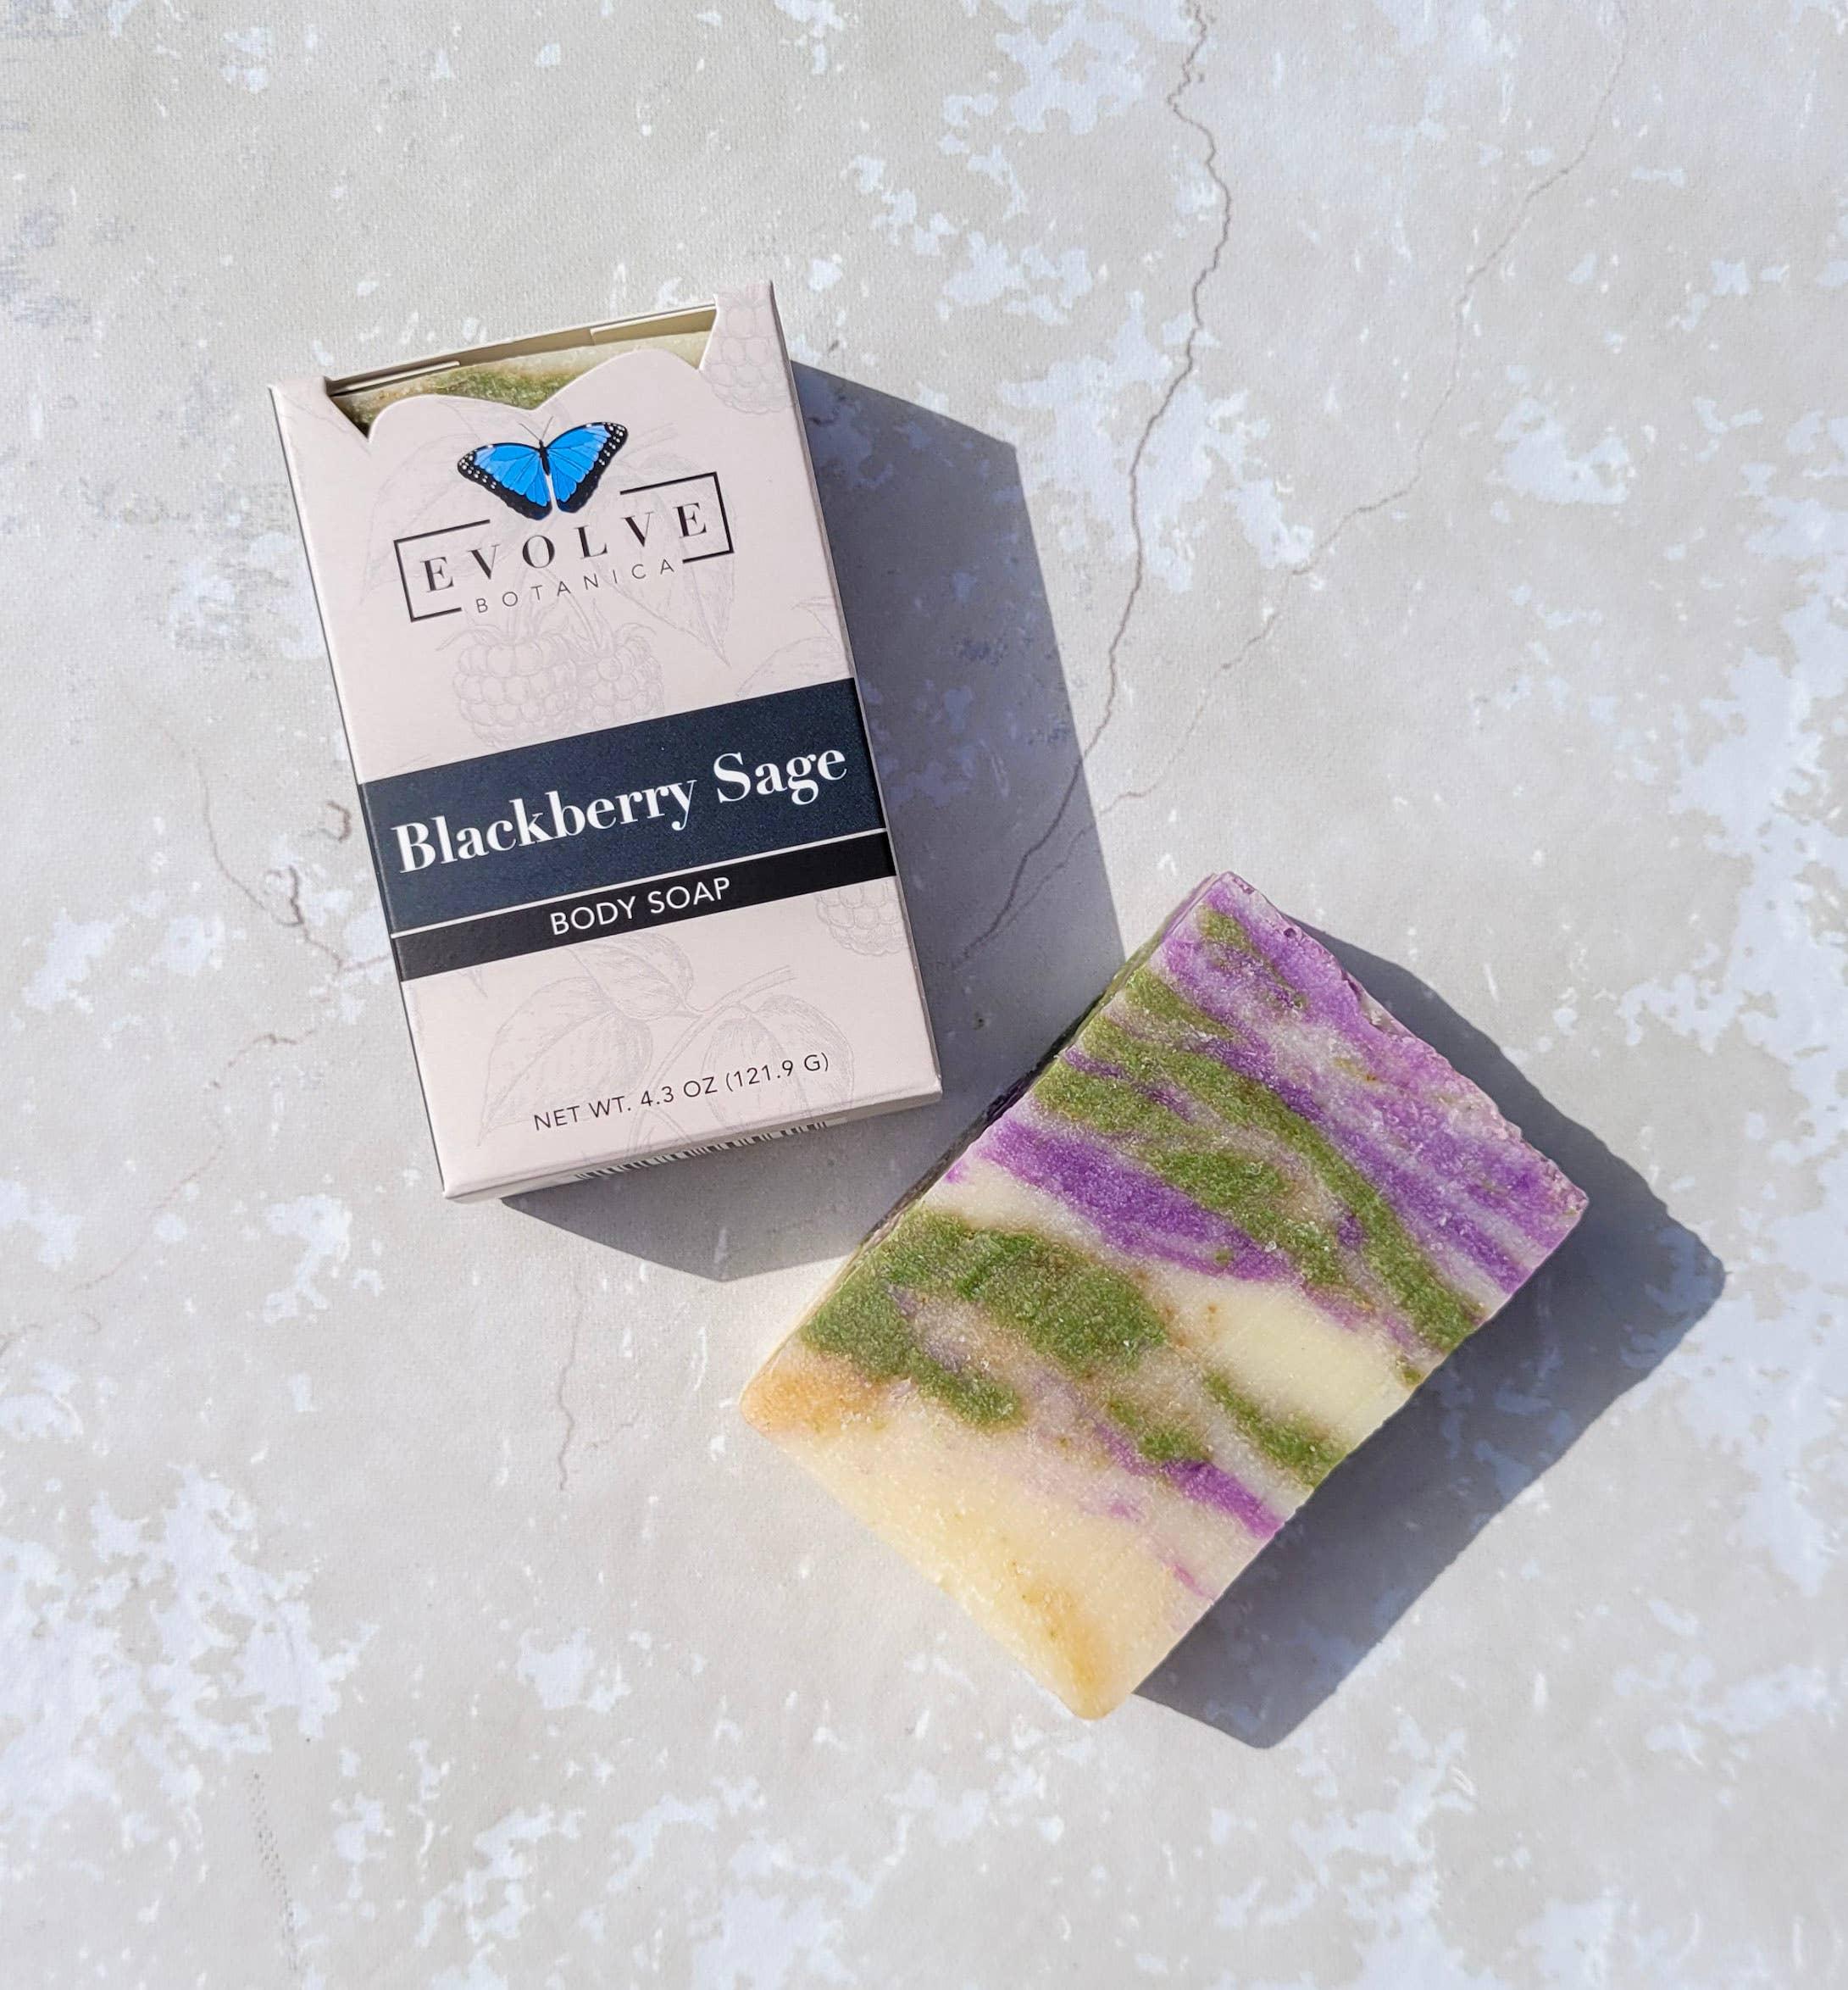 Evolve - Standard Soap - Blackberry Sage | Trada Marketplace